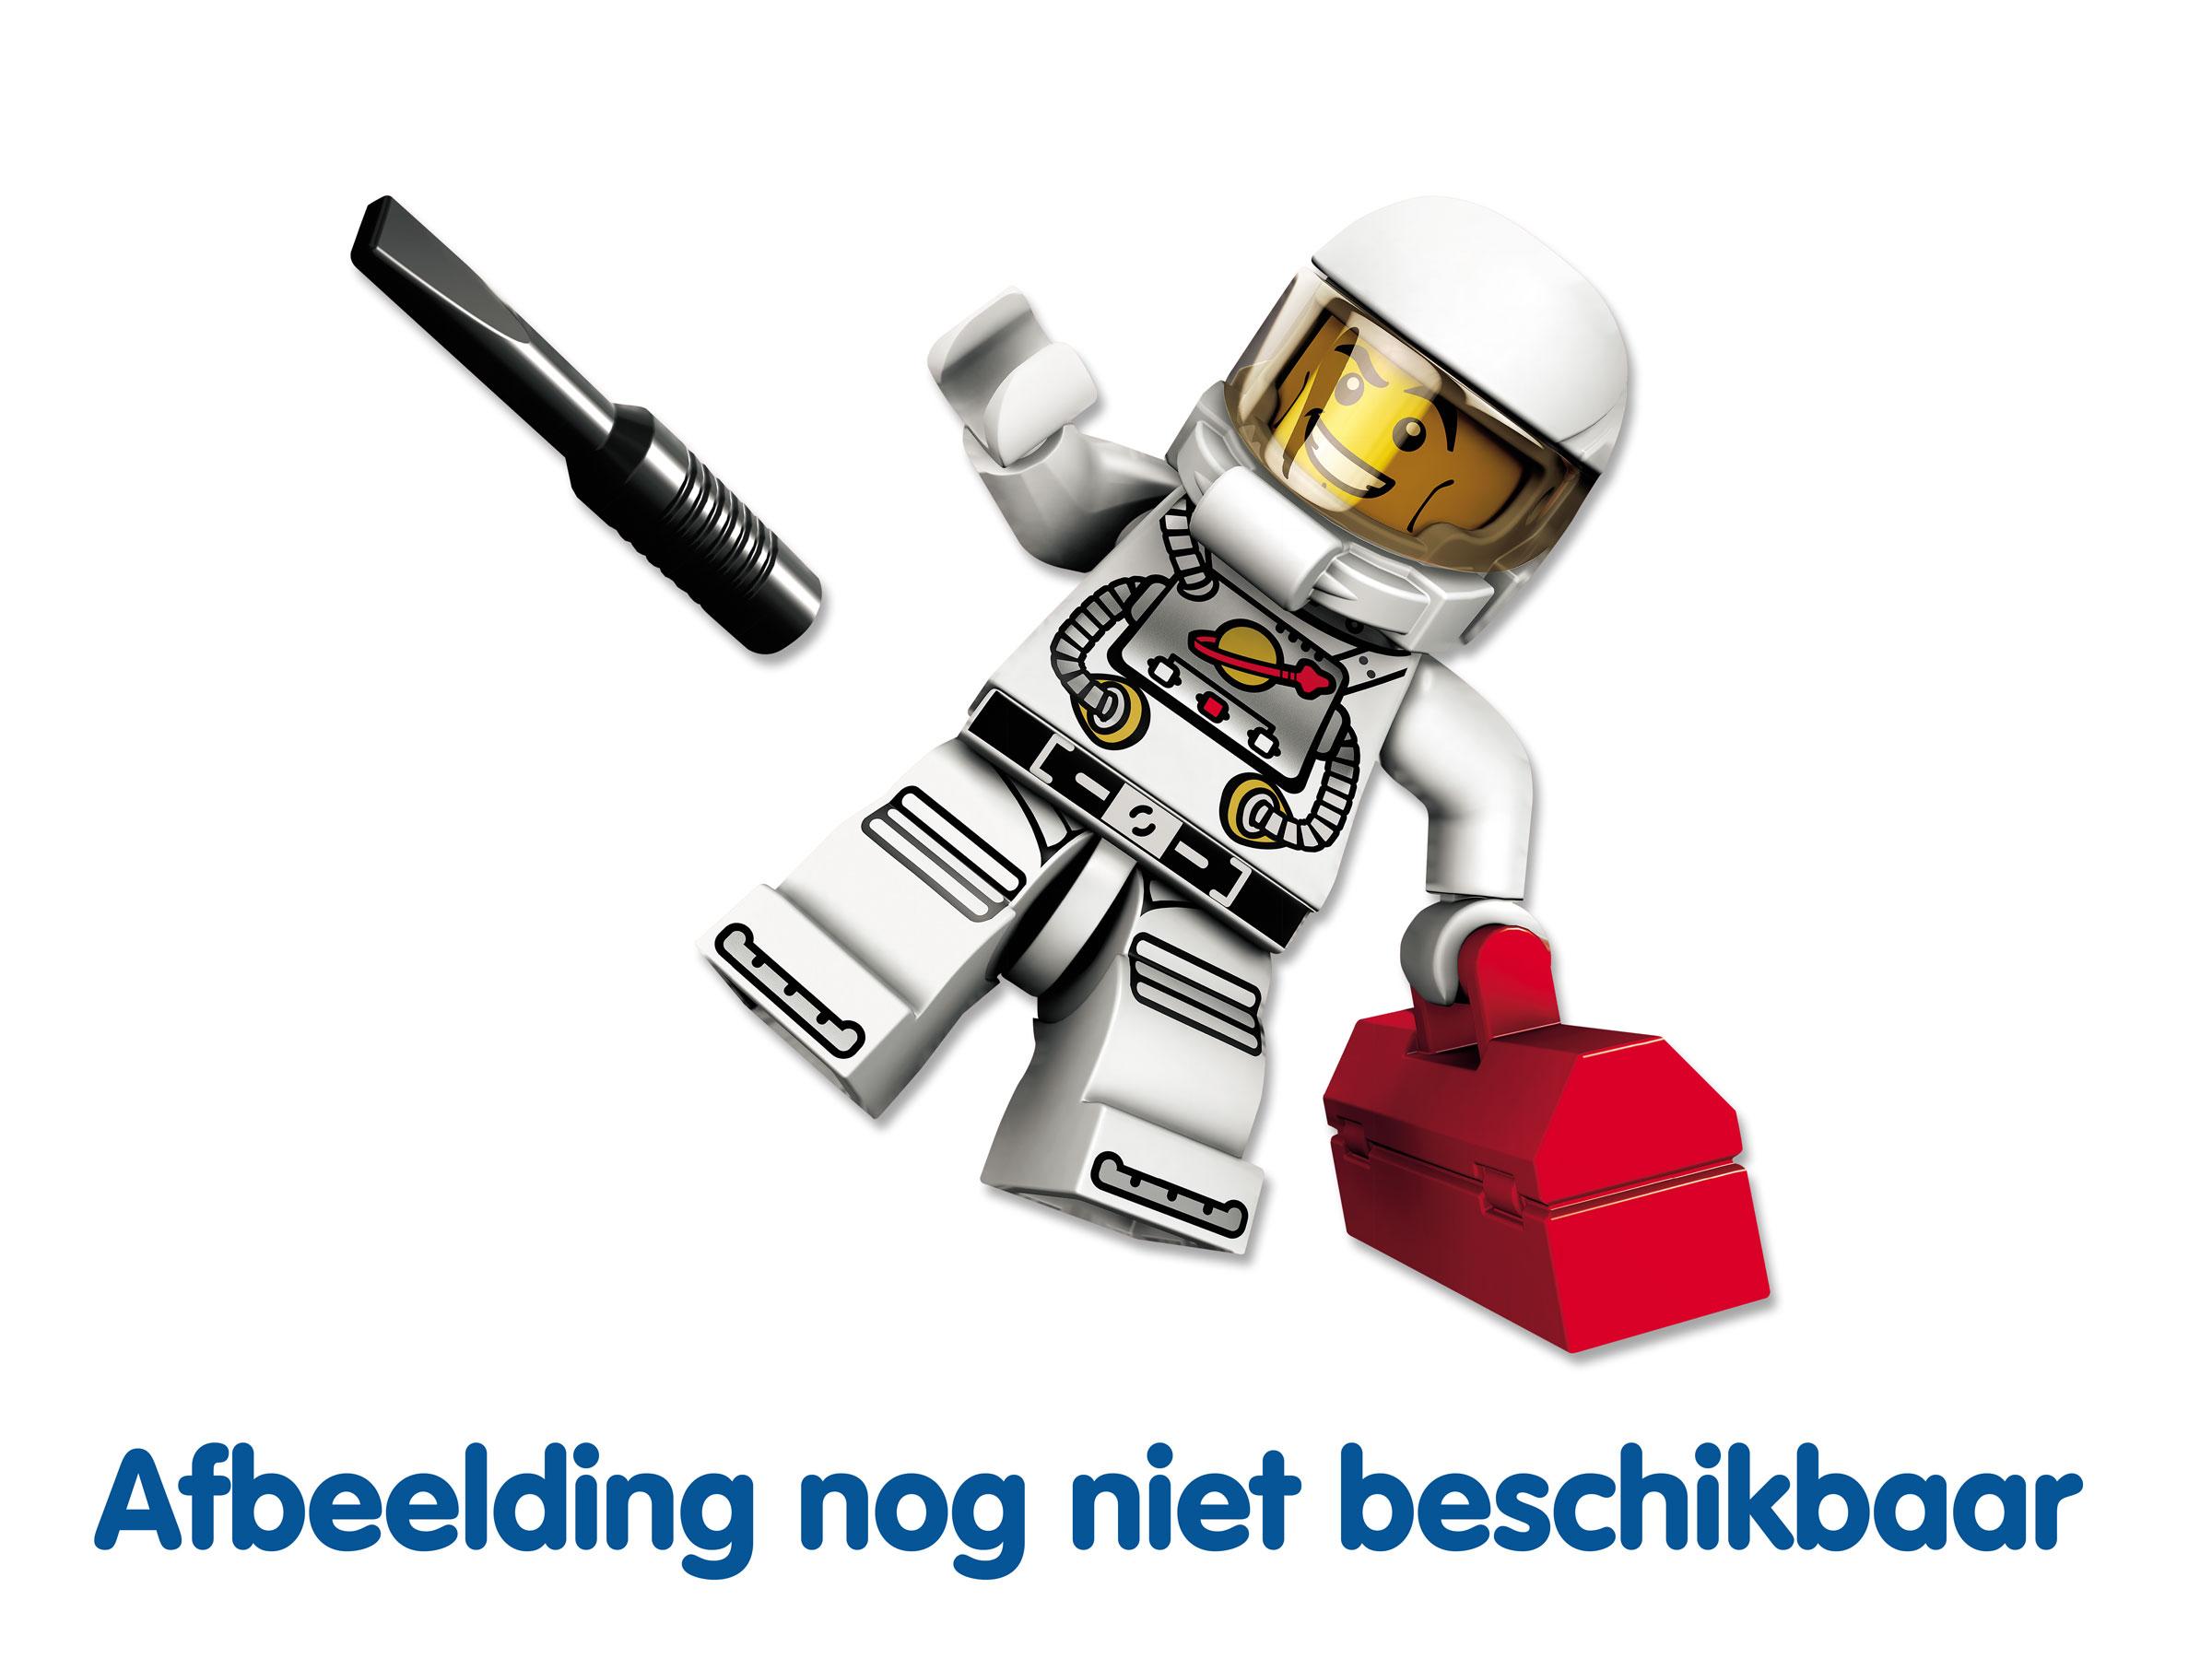 LEGO Technic 42049 Mijnbouwgraafmachine